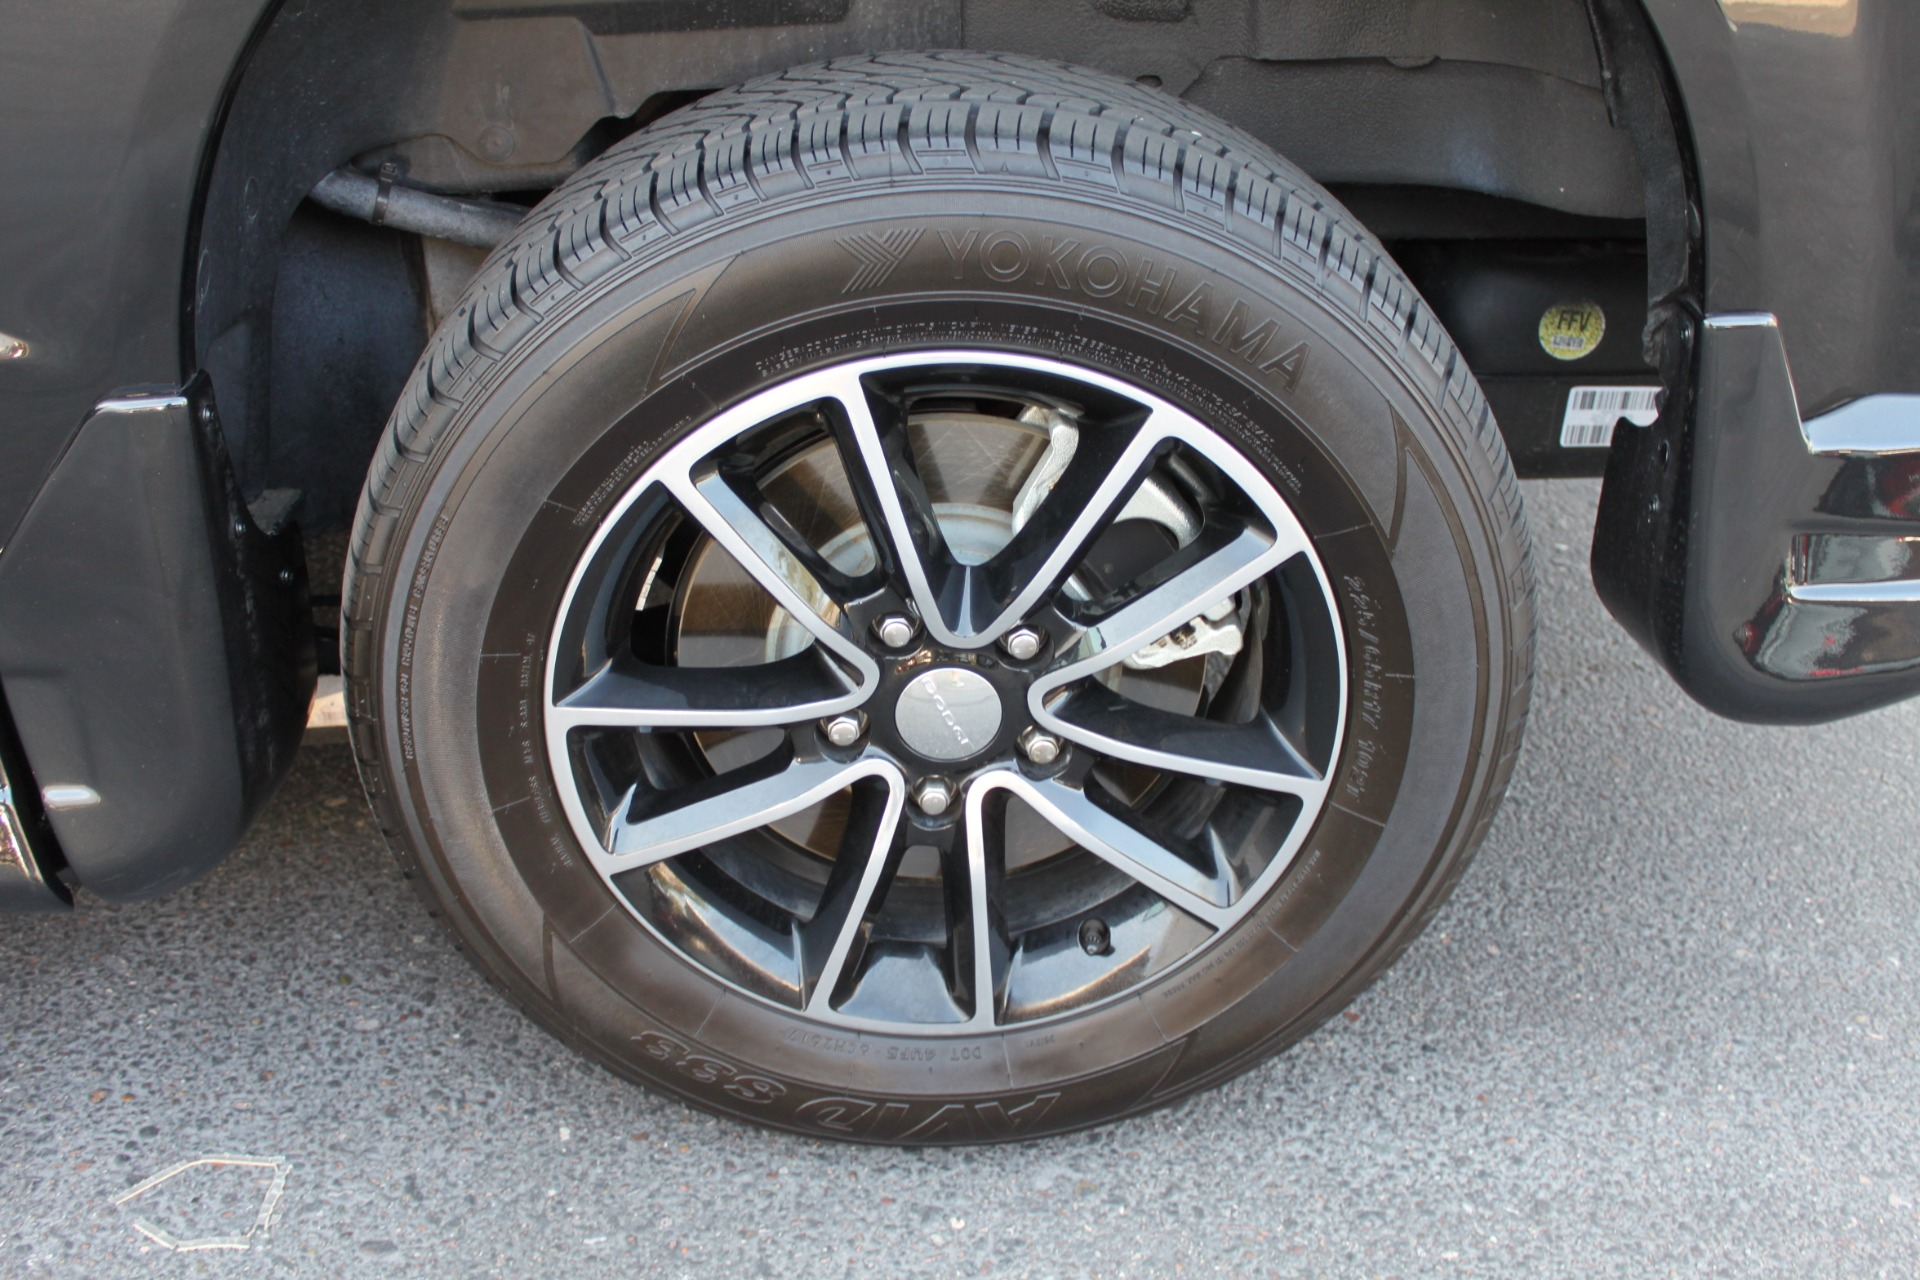 Used-2018-Dodge-Grand-Caravan-SXT-Rollx-Mobility-Conversion-Camaro